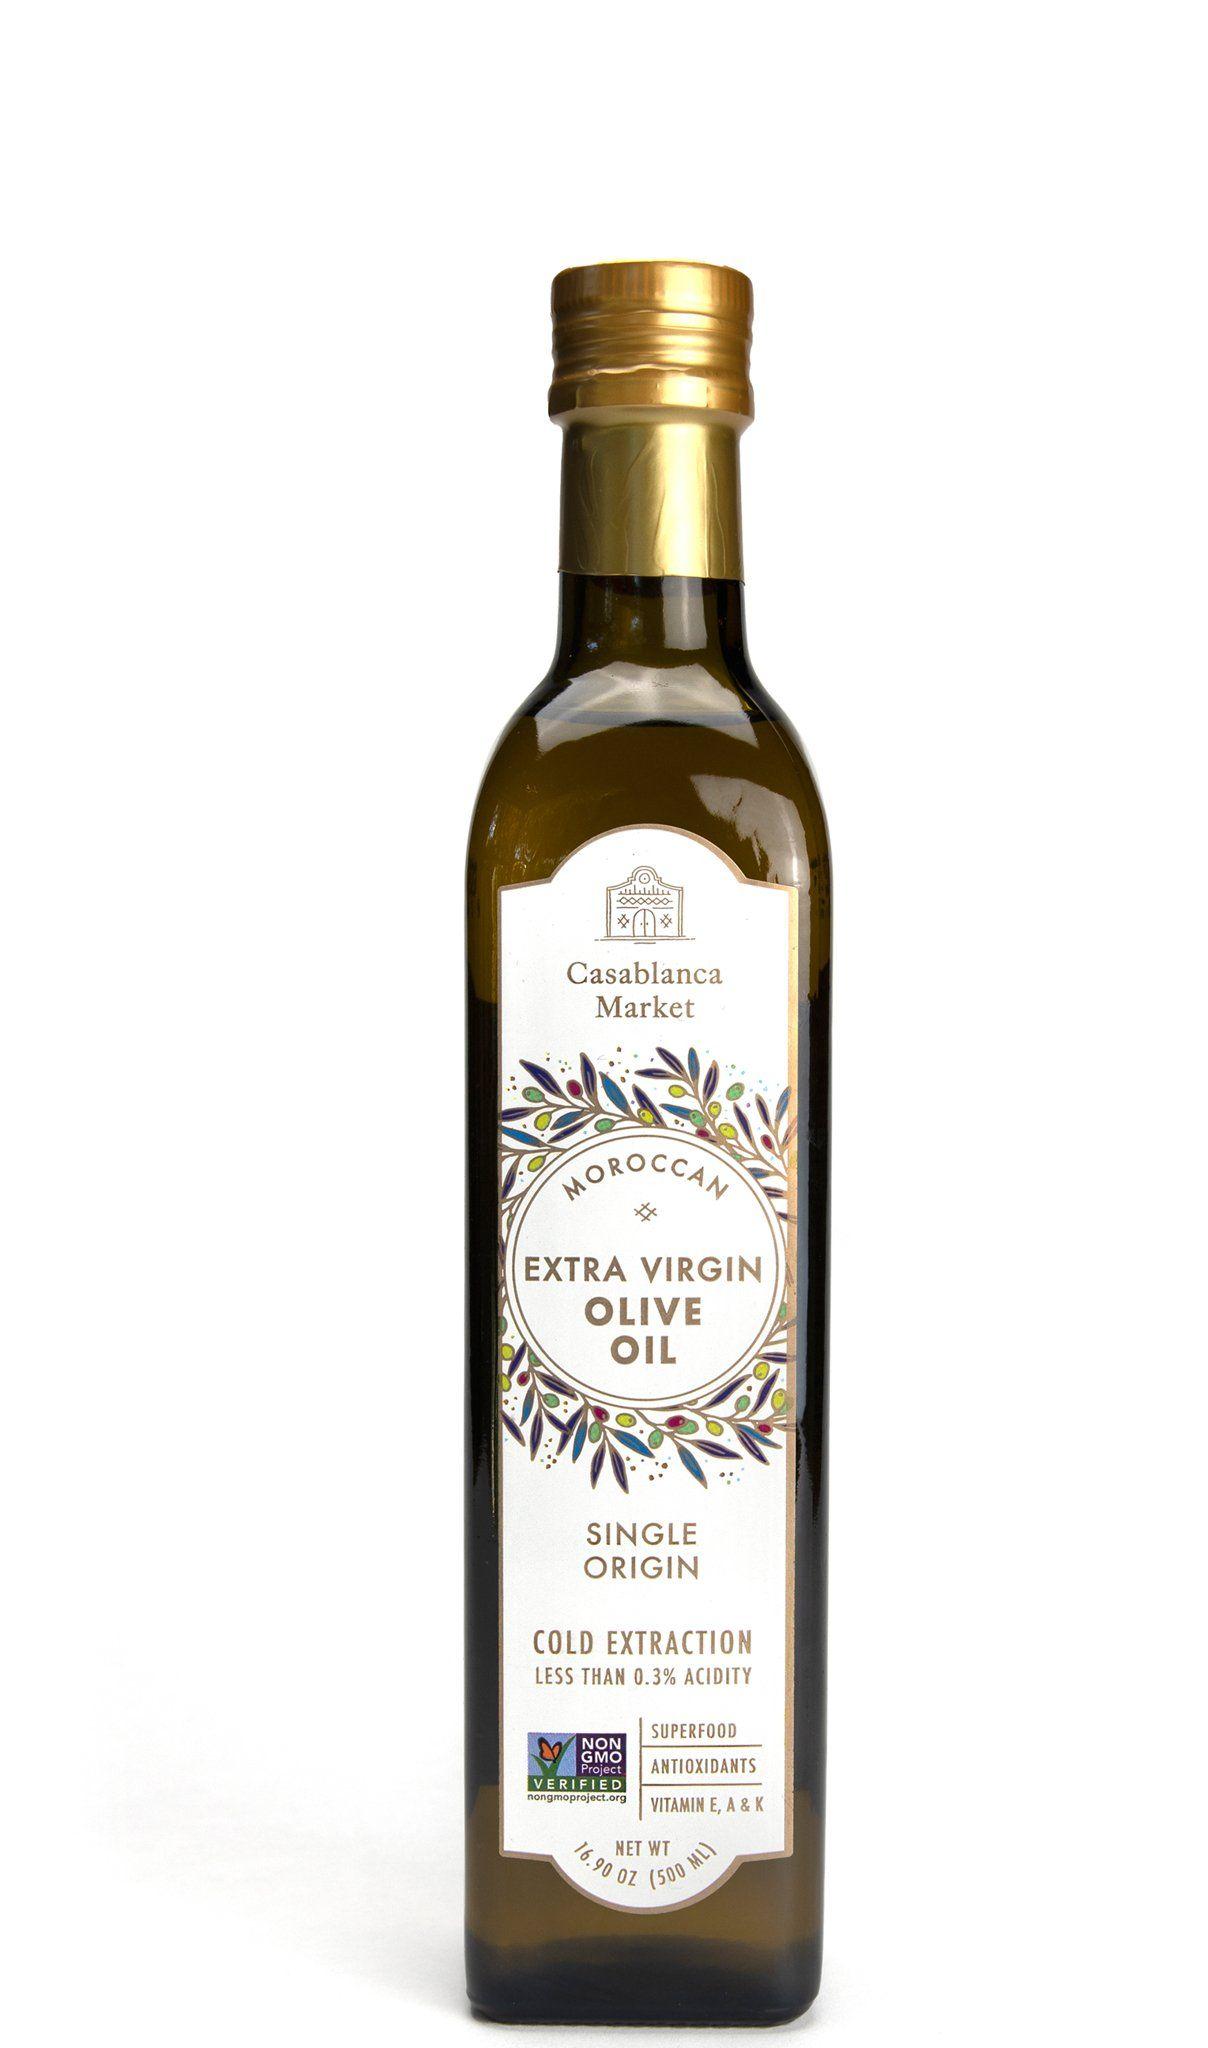 Casablanca Market Moroccan Extra Virgin Olive Oil, Glass Bottle (500mL) - Wholesale